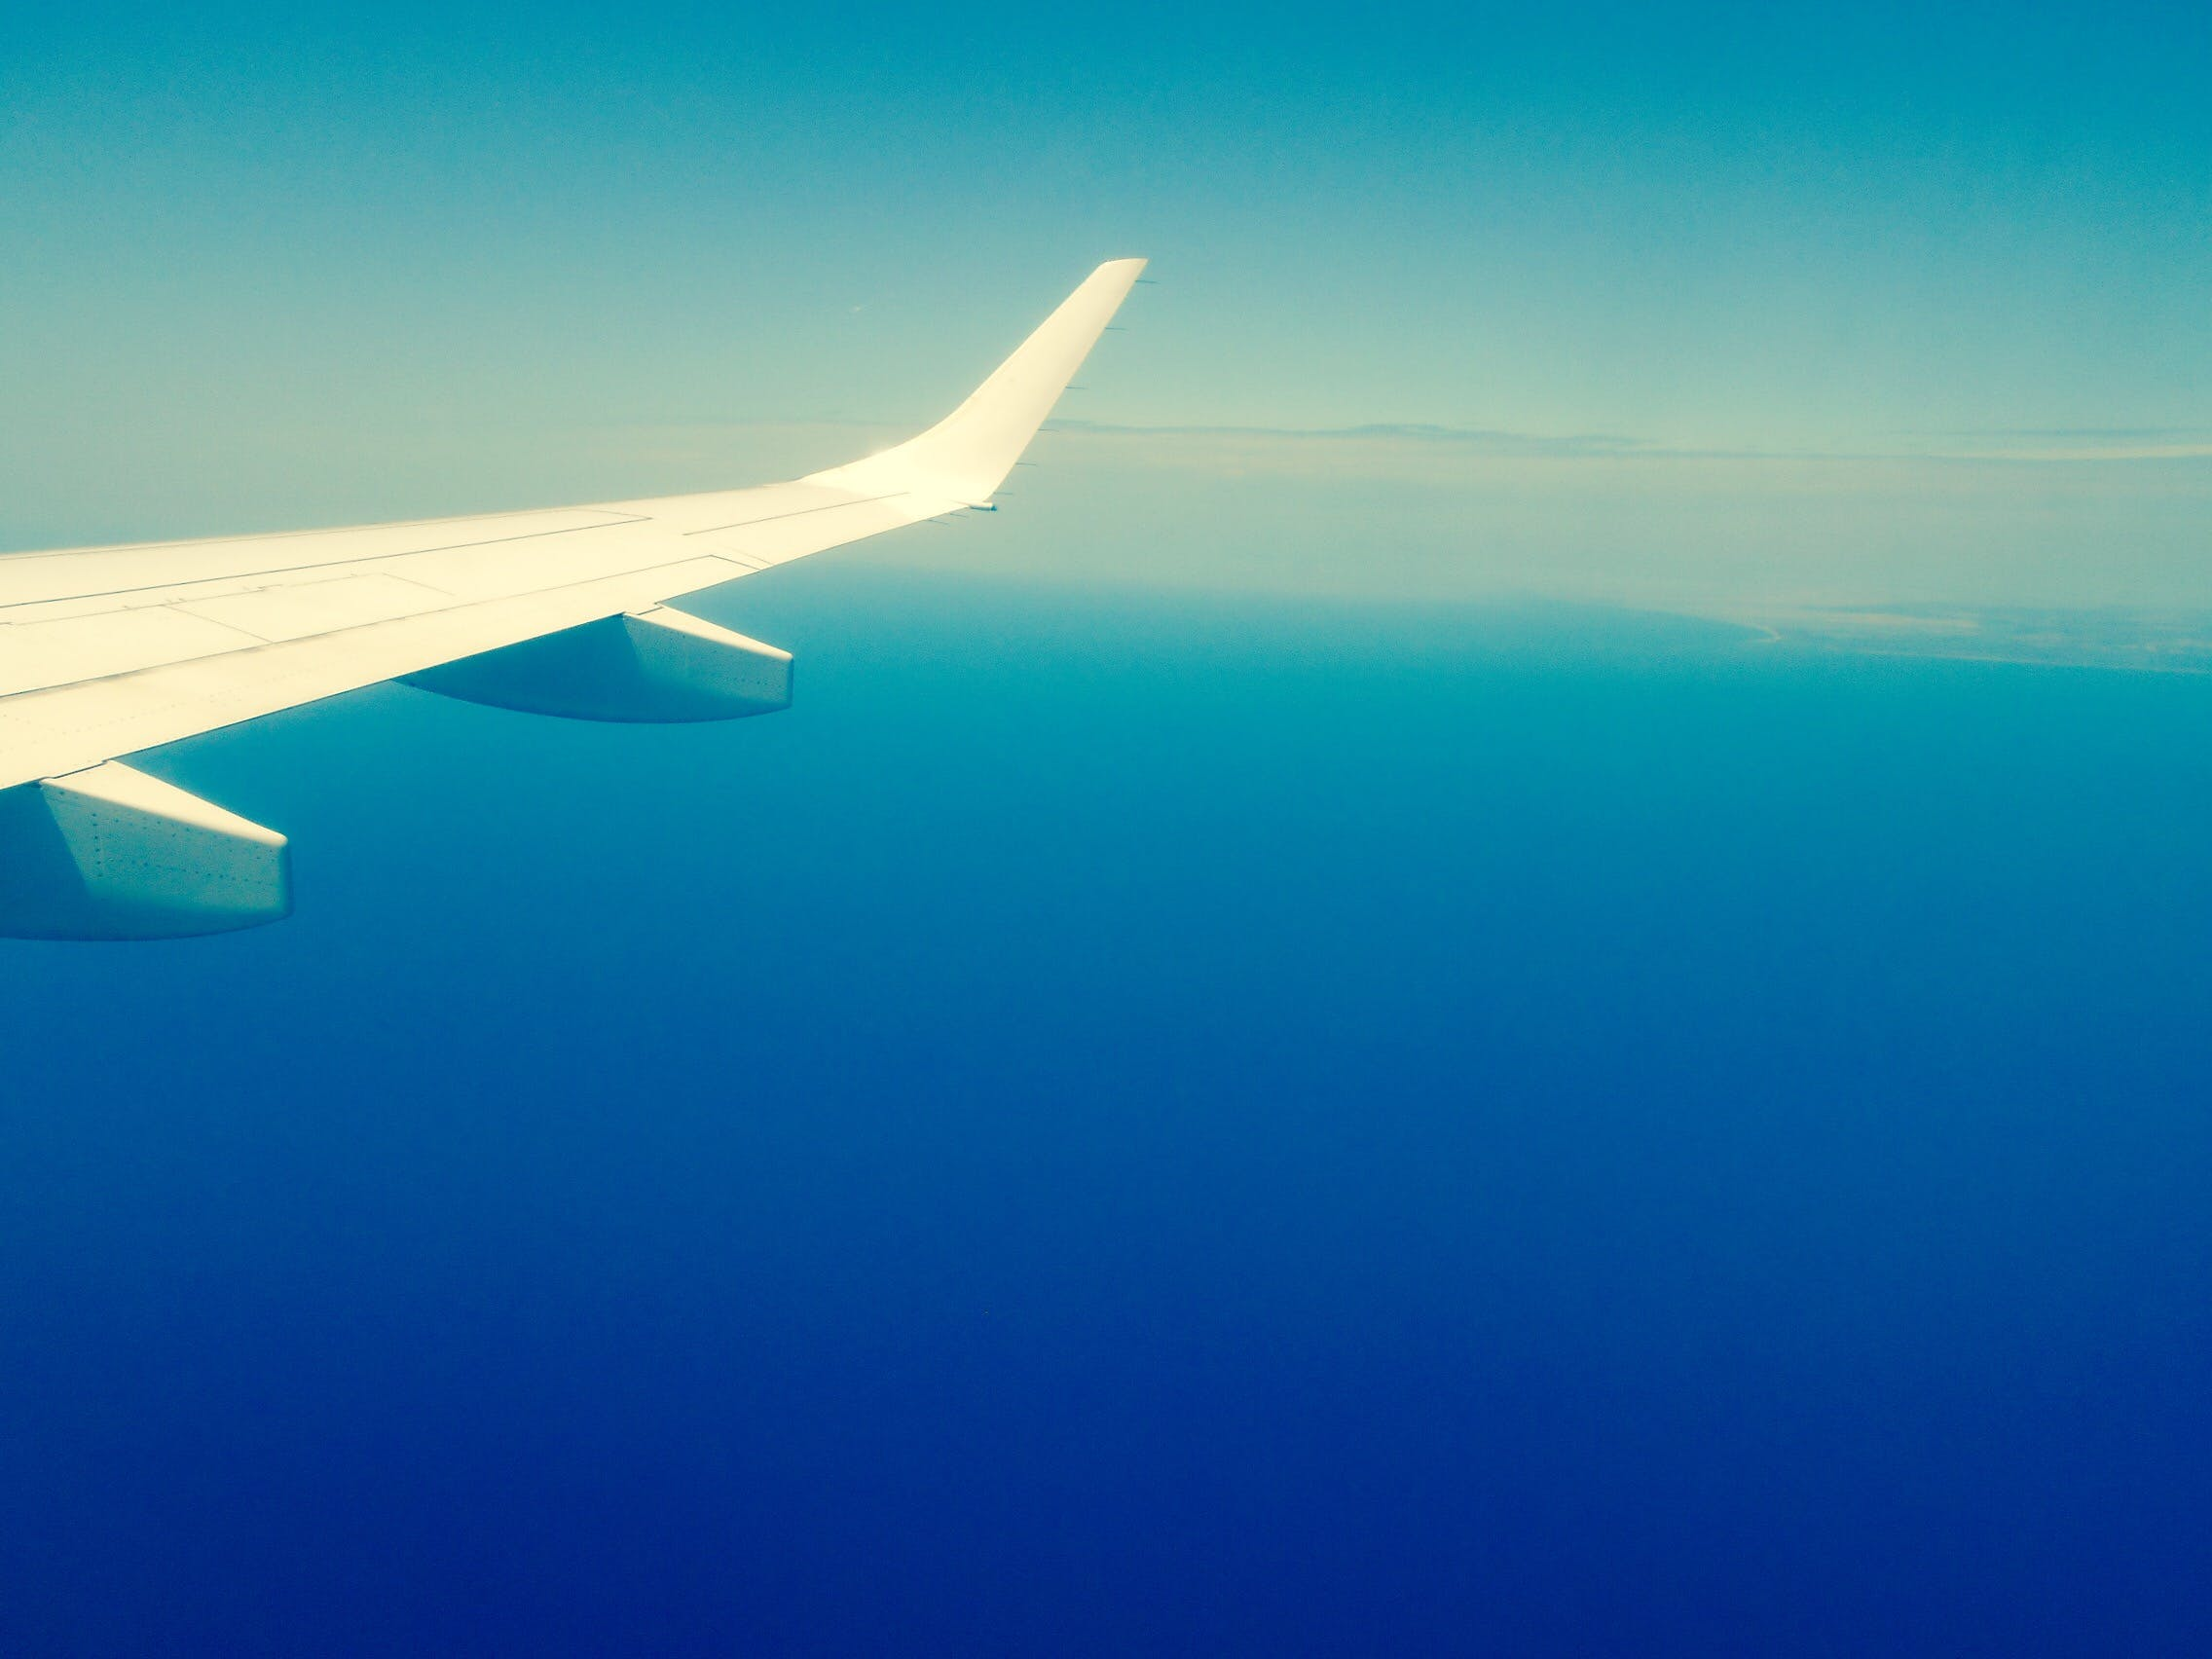 aeroplane, air, aircraft